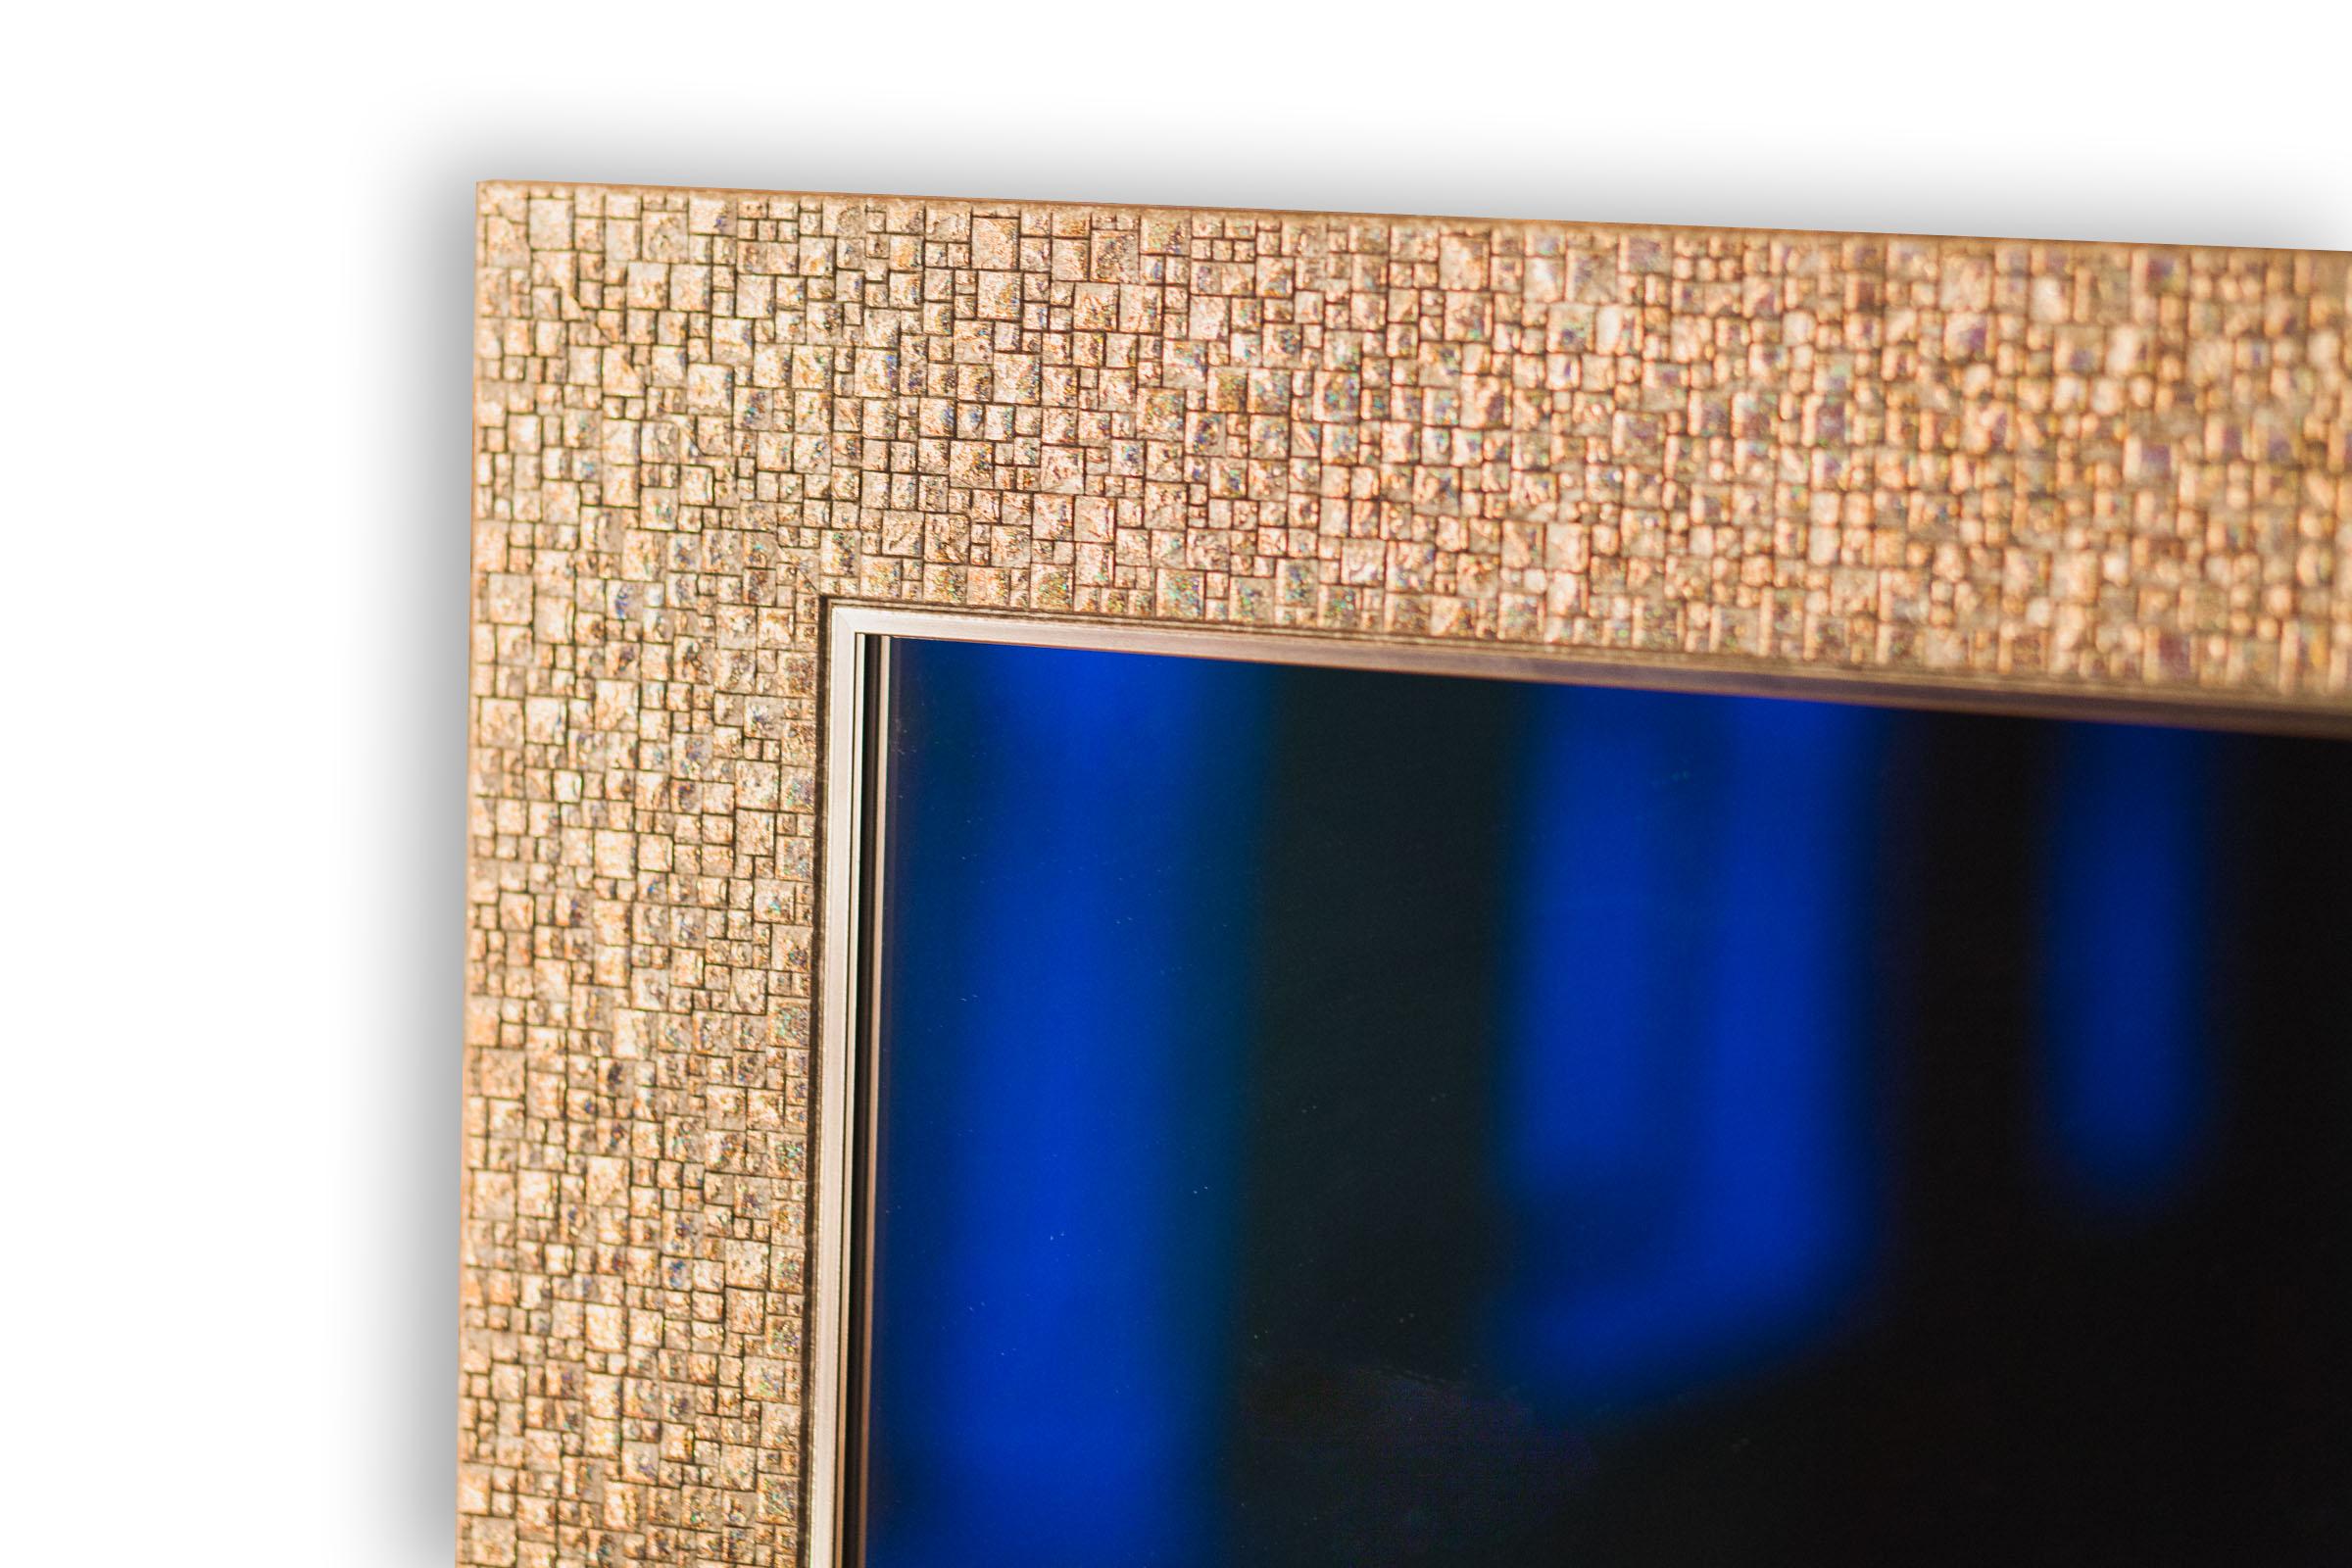 Купить Зеркало Q582-27 c рамой в комплекте, 800х600 мм